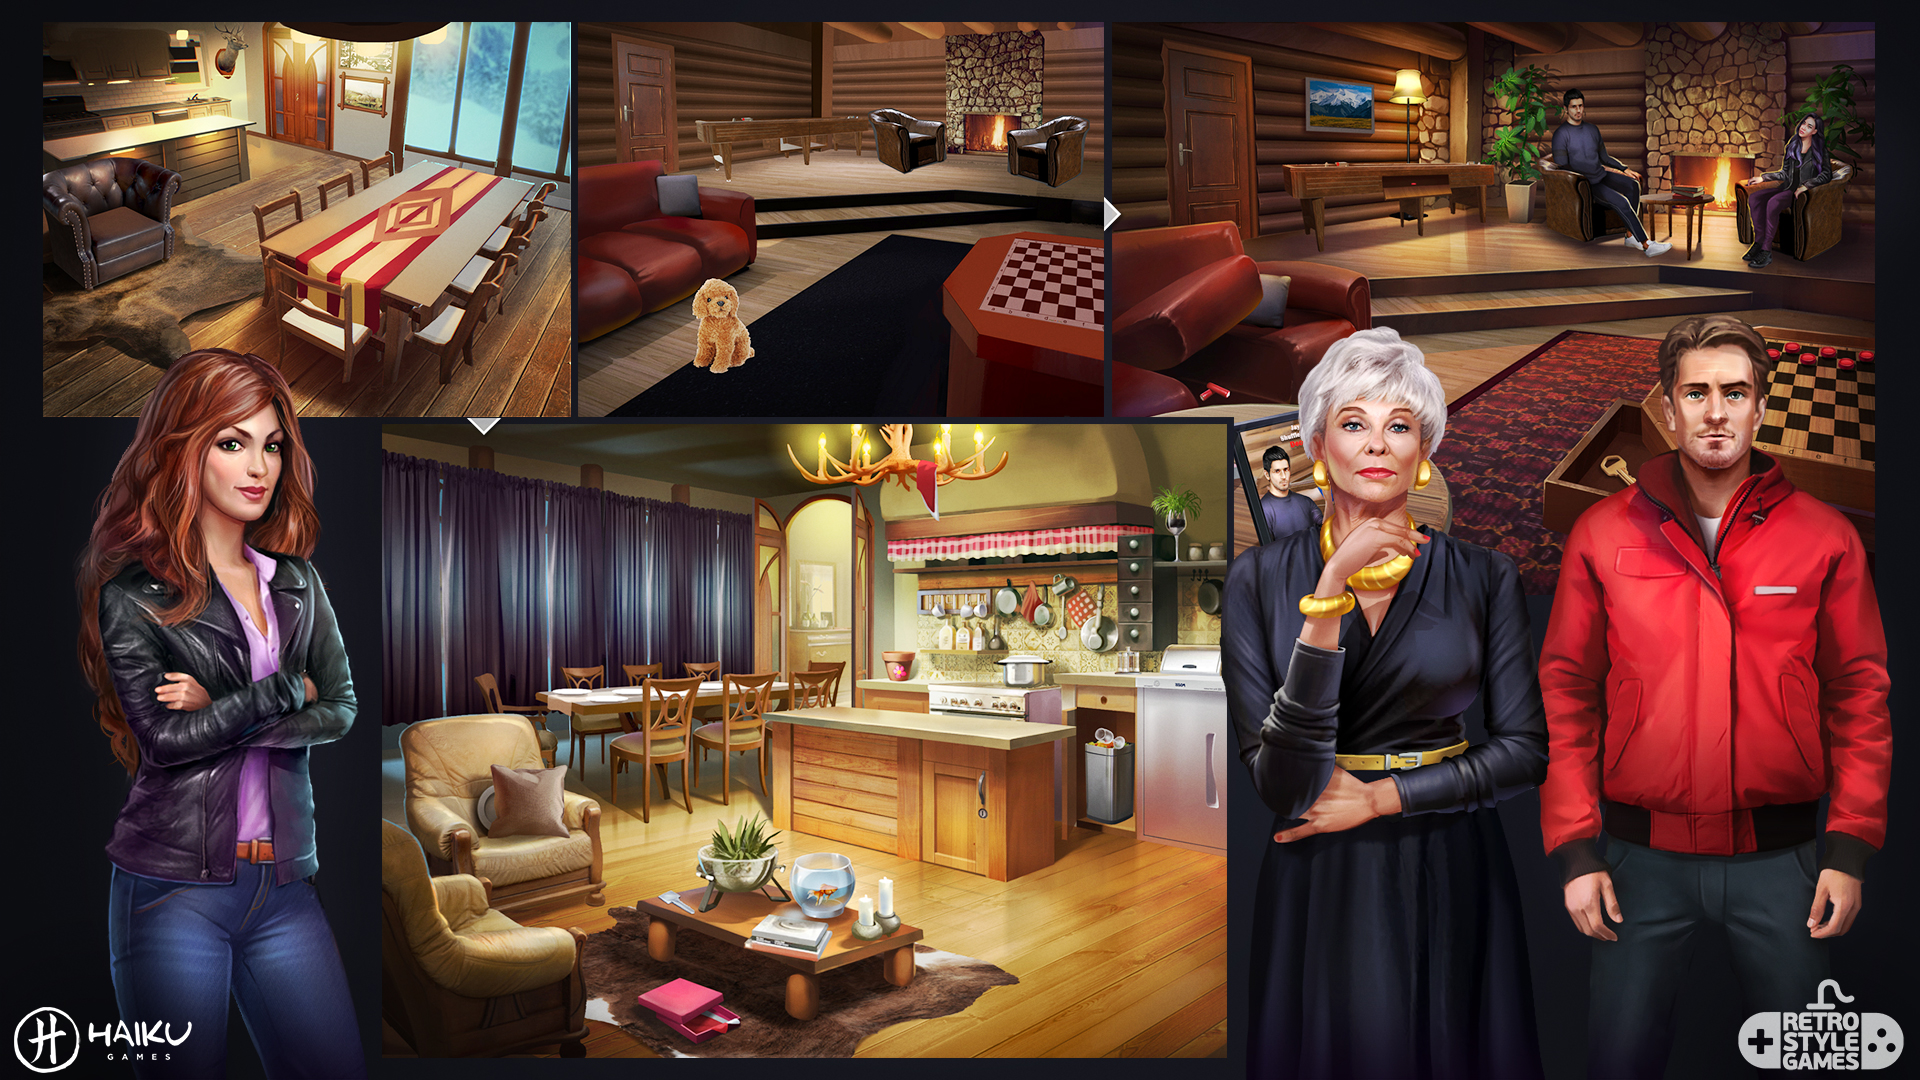 HAIKU Adventure Escape Murder Inn full art sheet3